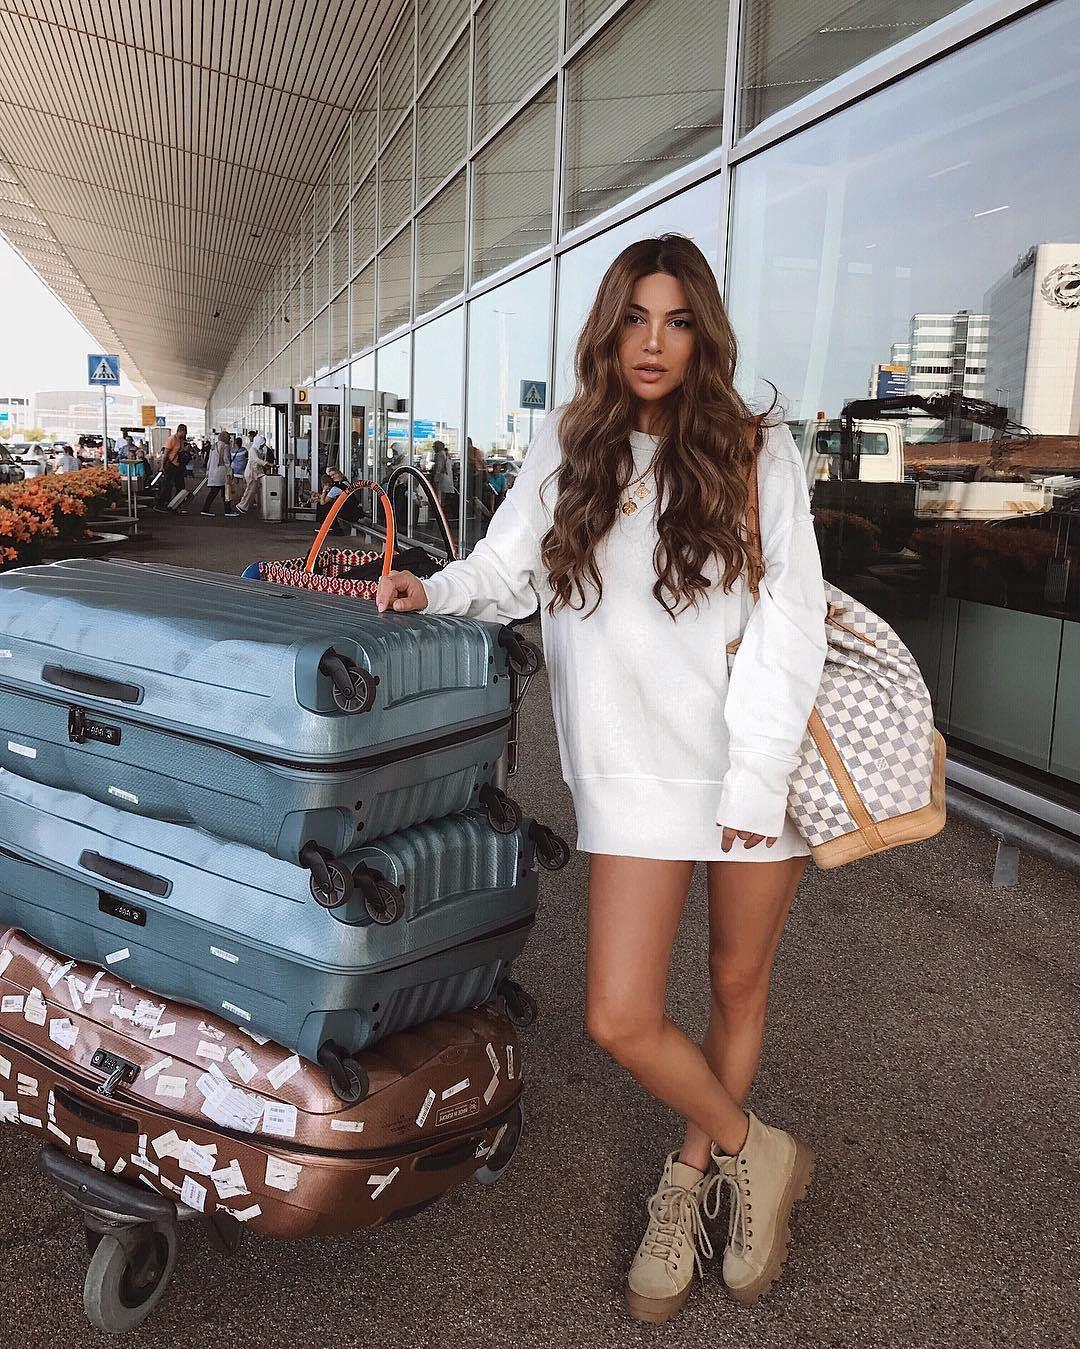 Cute outfit ideas negin mirsalehi style, fashion blogger, street fashion, fashion blog, human body